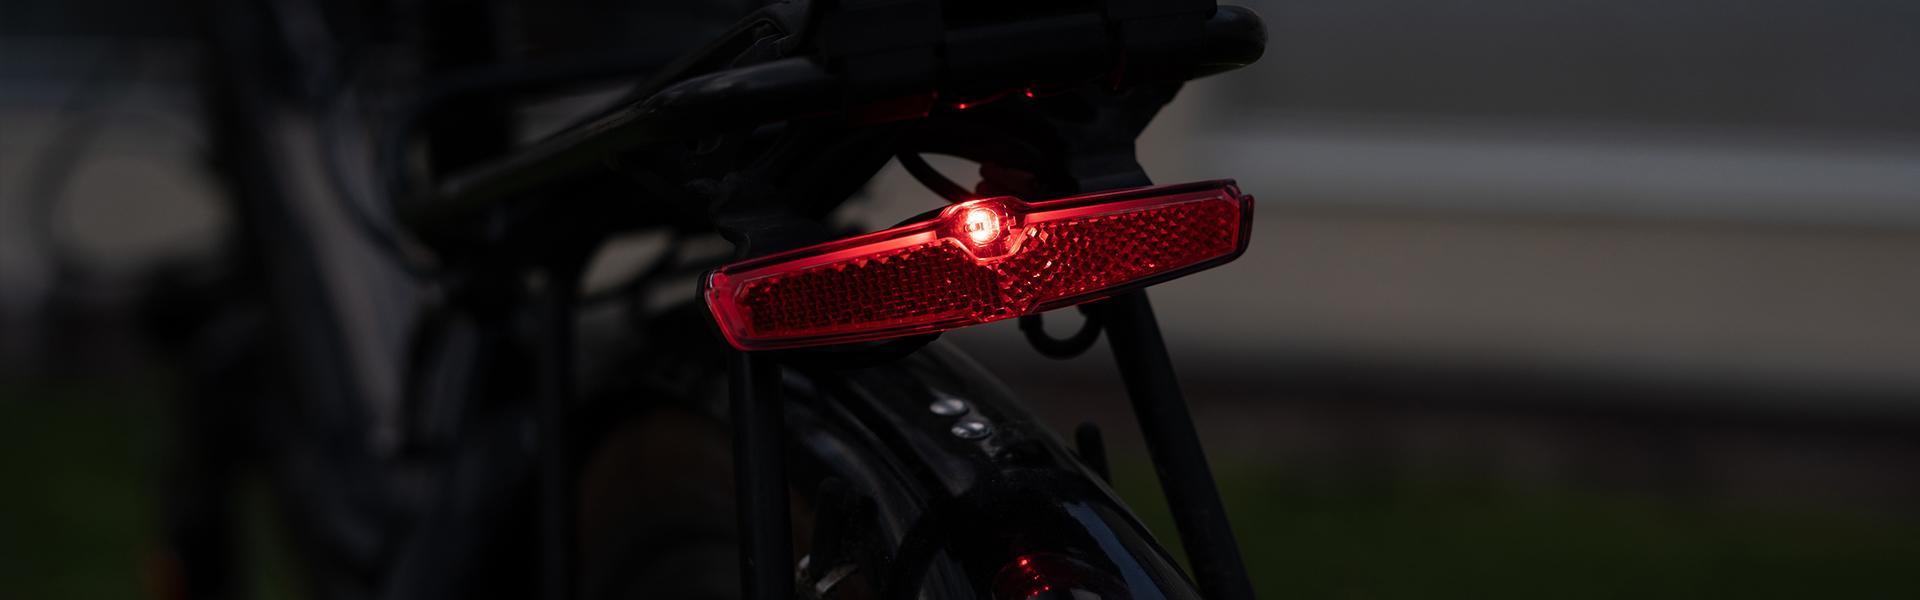 Sate-lite 300lumen USB rechargeable bike light eletric bike front light CREE LED waterproof